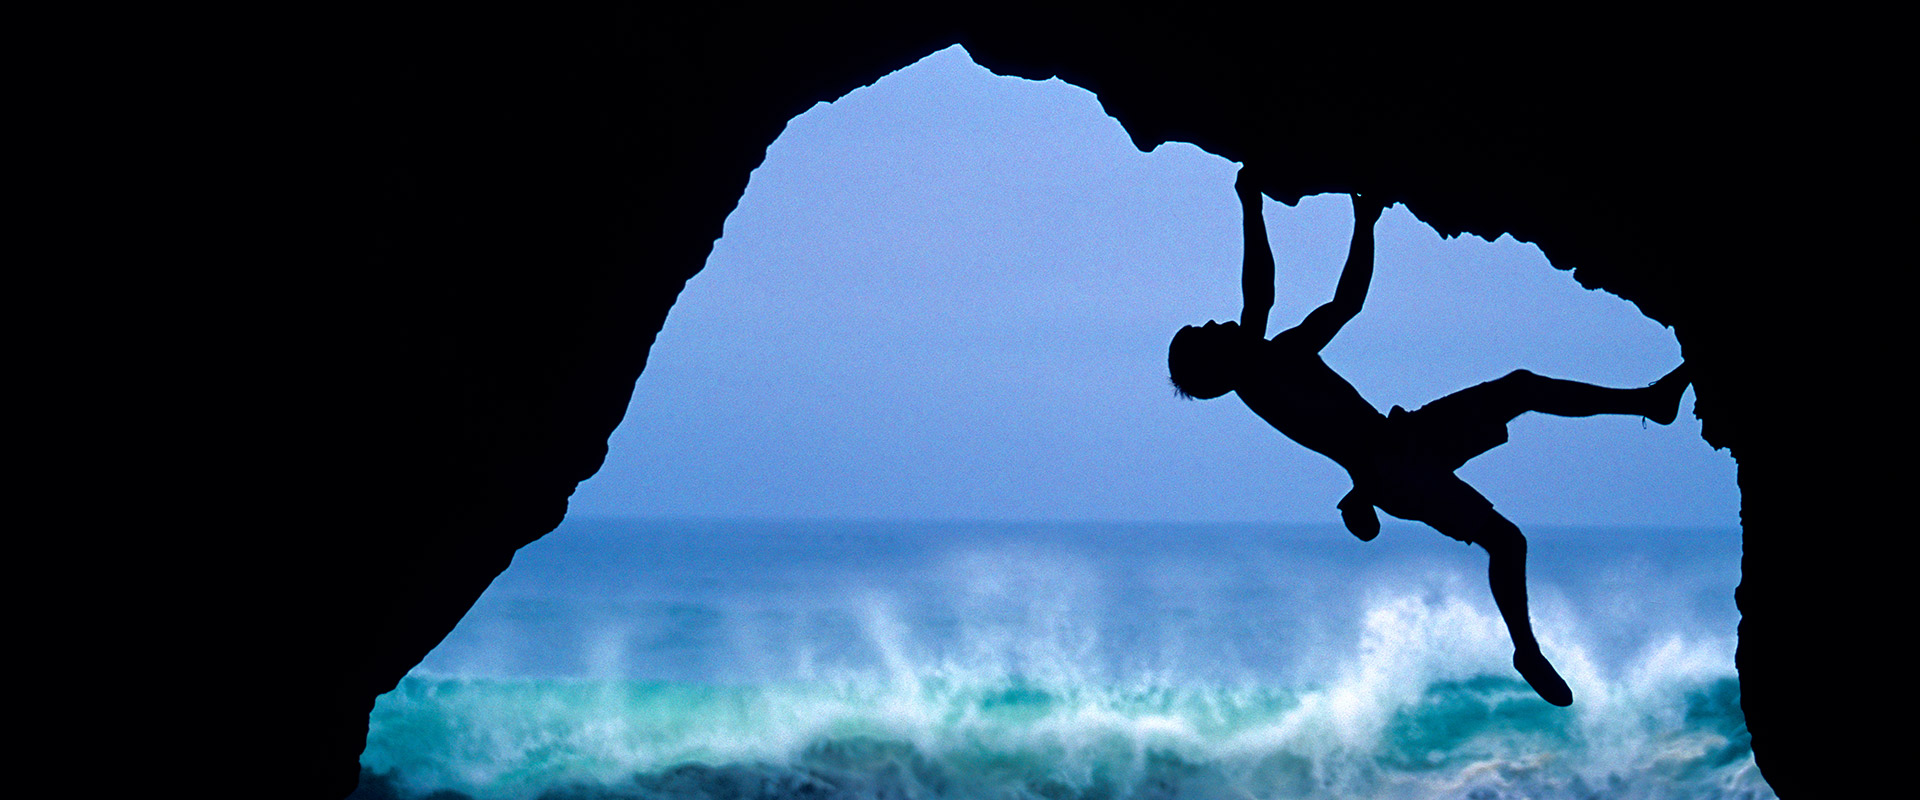 vimff best of climbing online corey rich making powerful climbing photography title bg